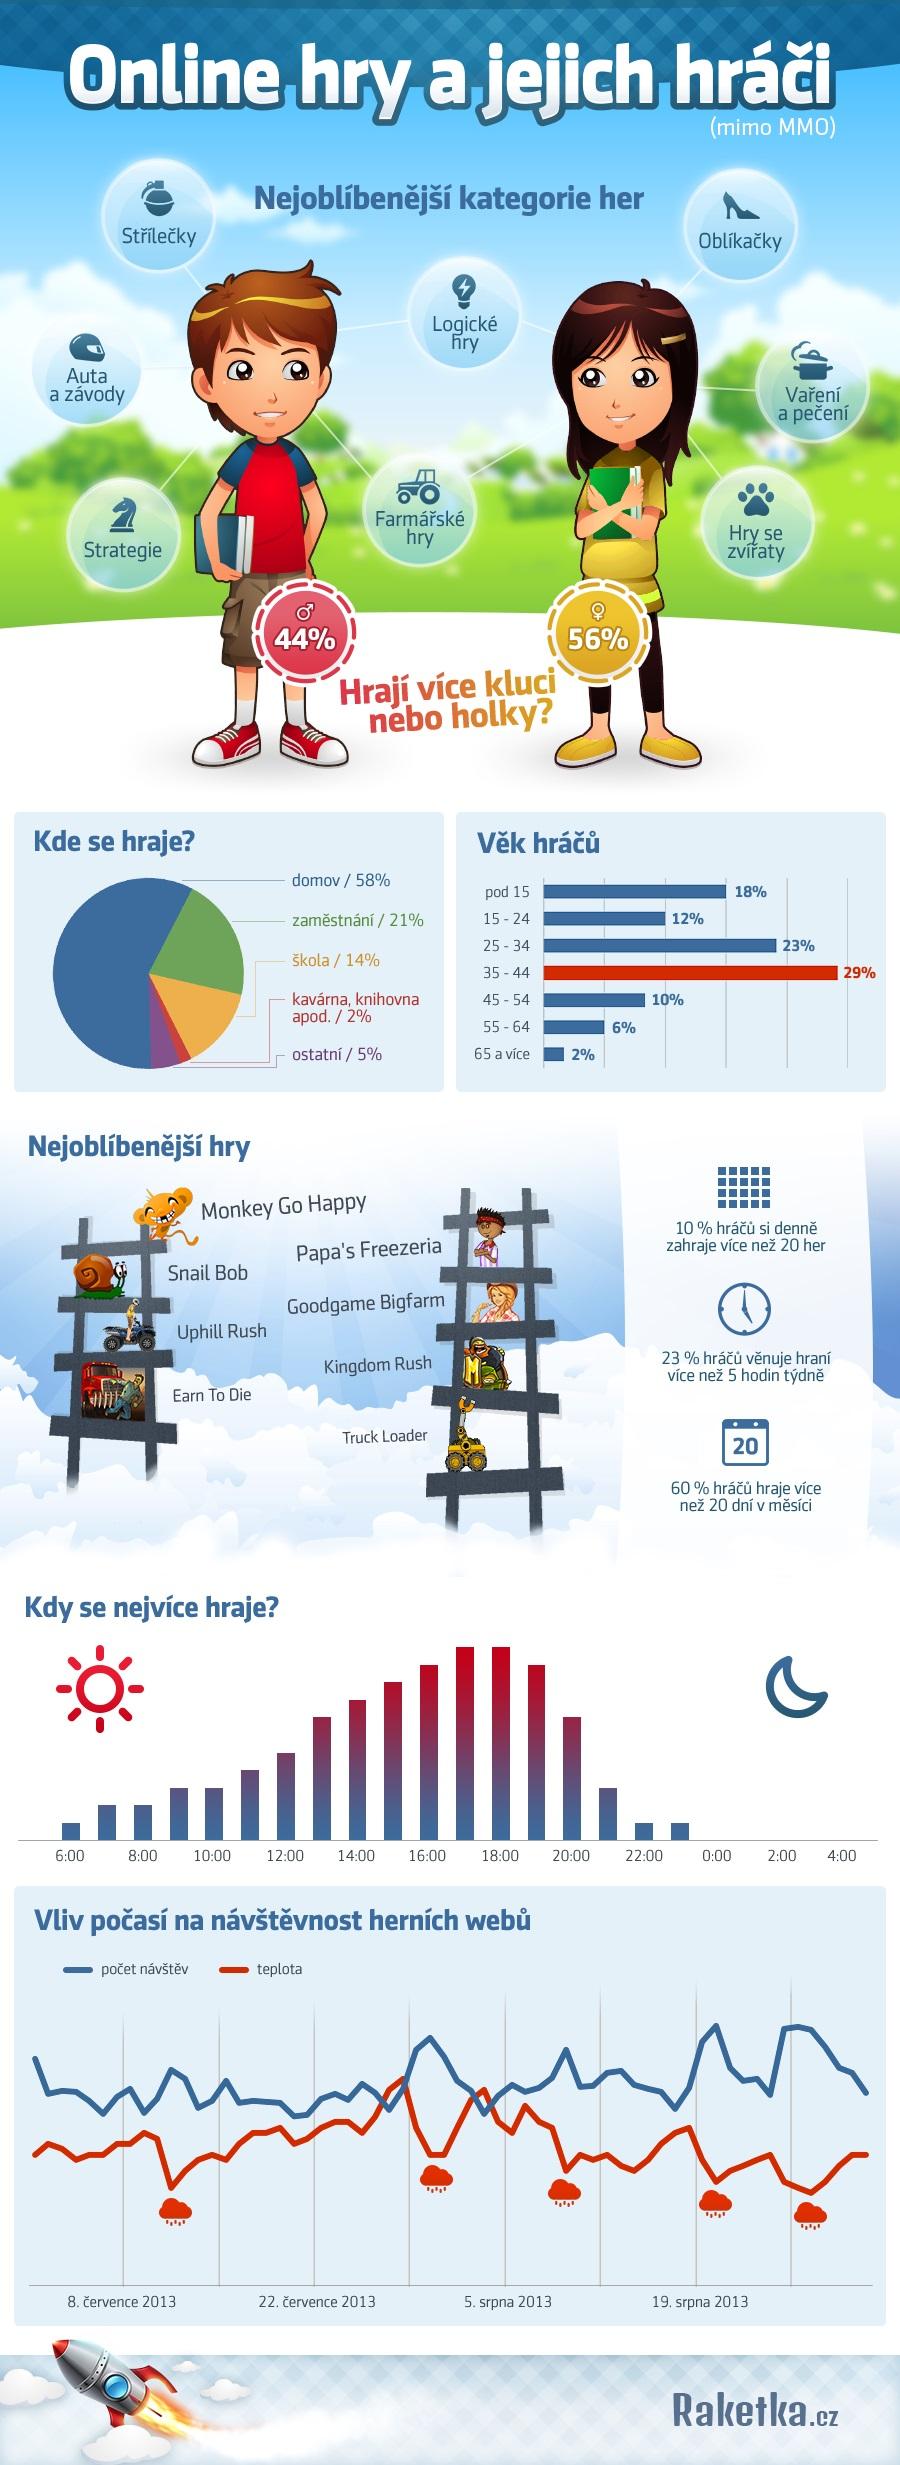 Infografika Raketka.cz